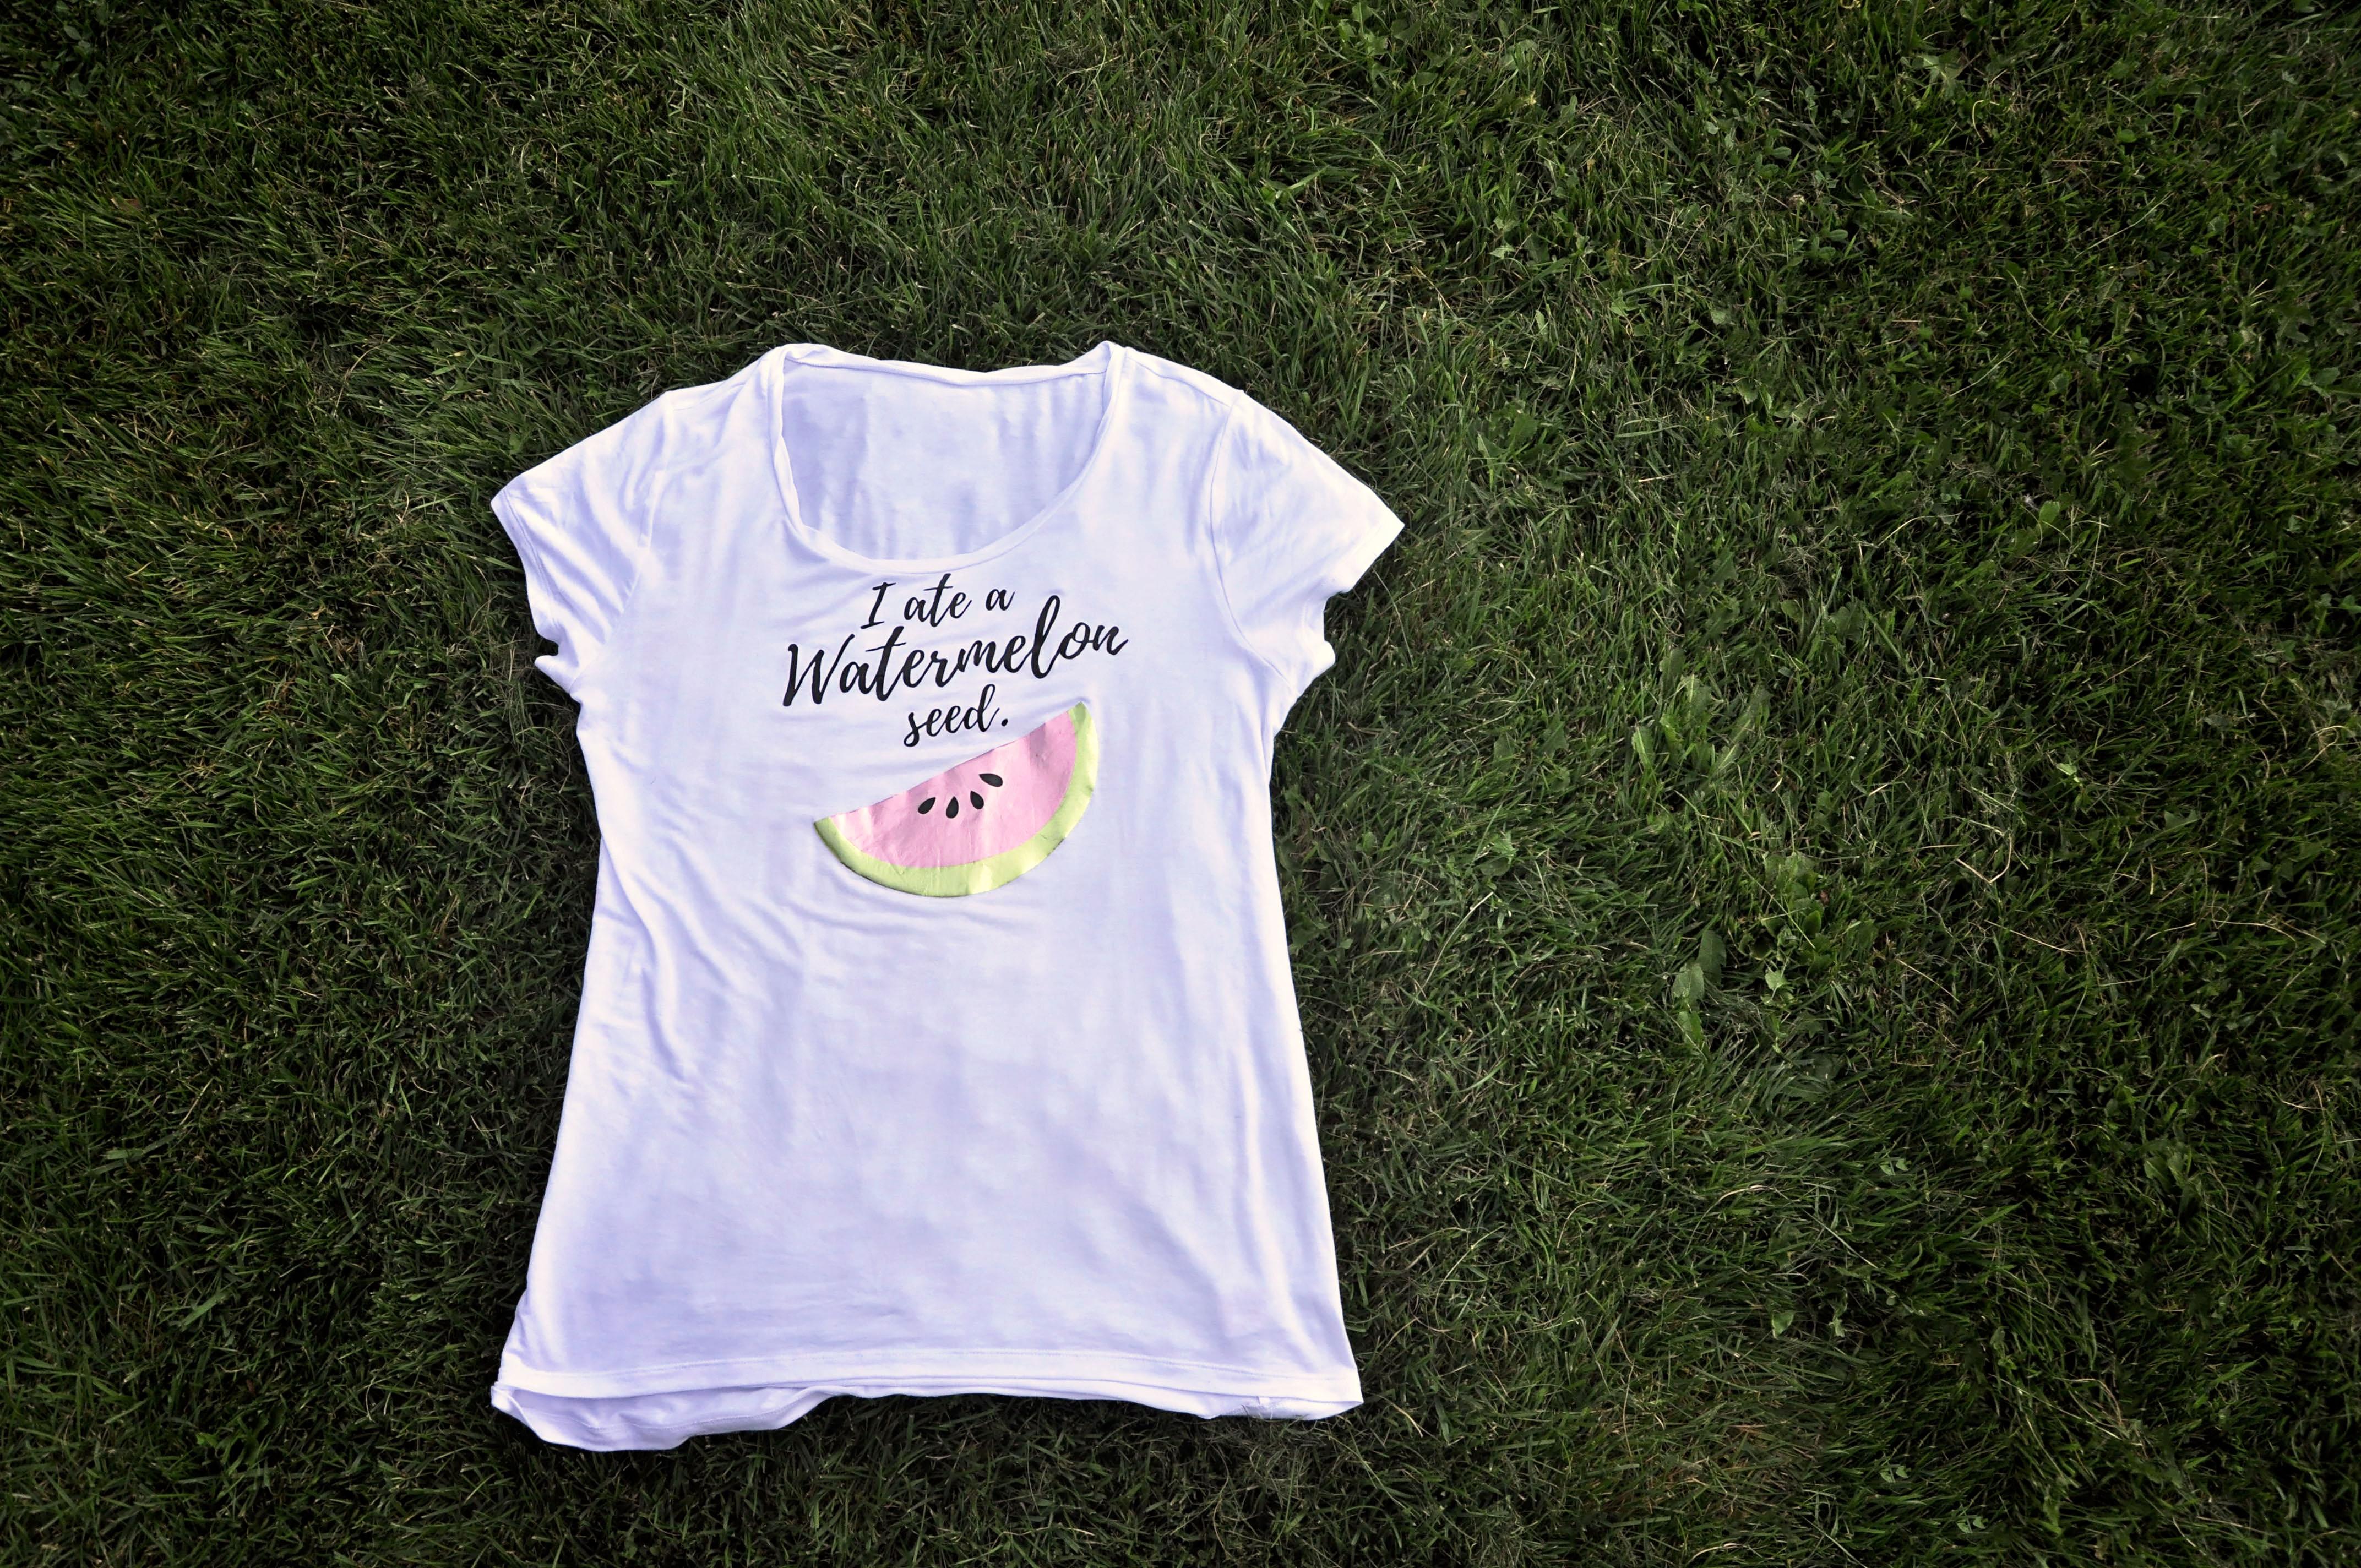 DIY Maternity T-shirt using your Cricut machine!